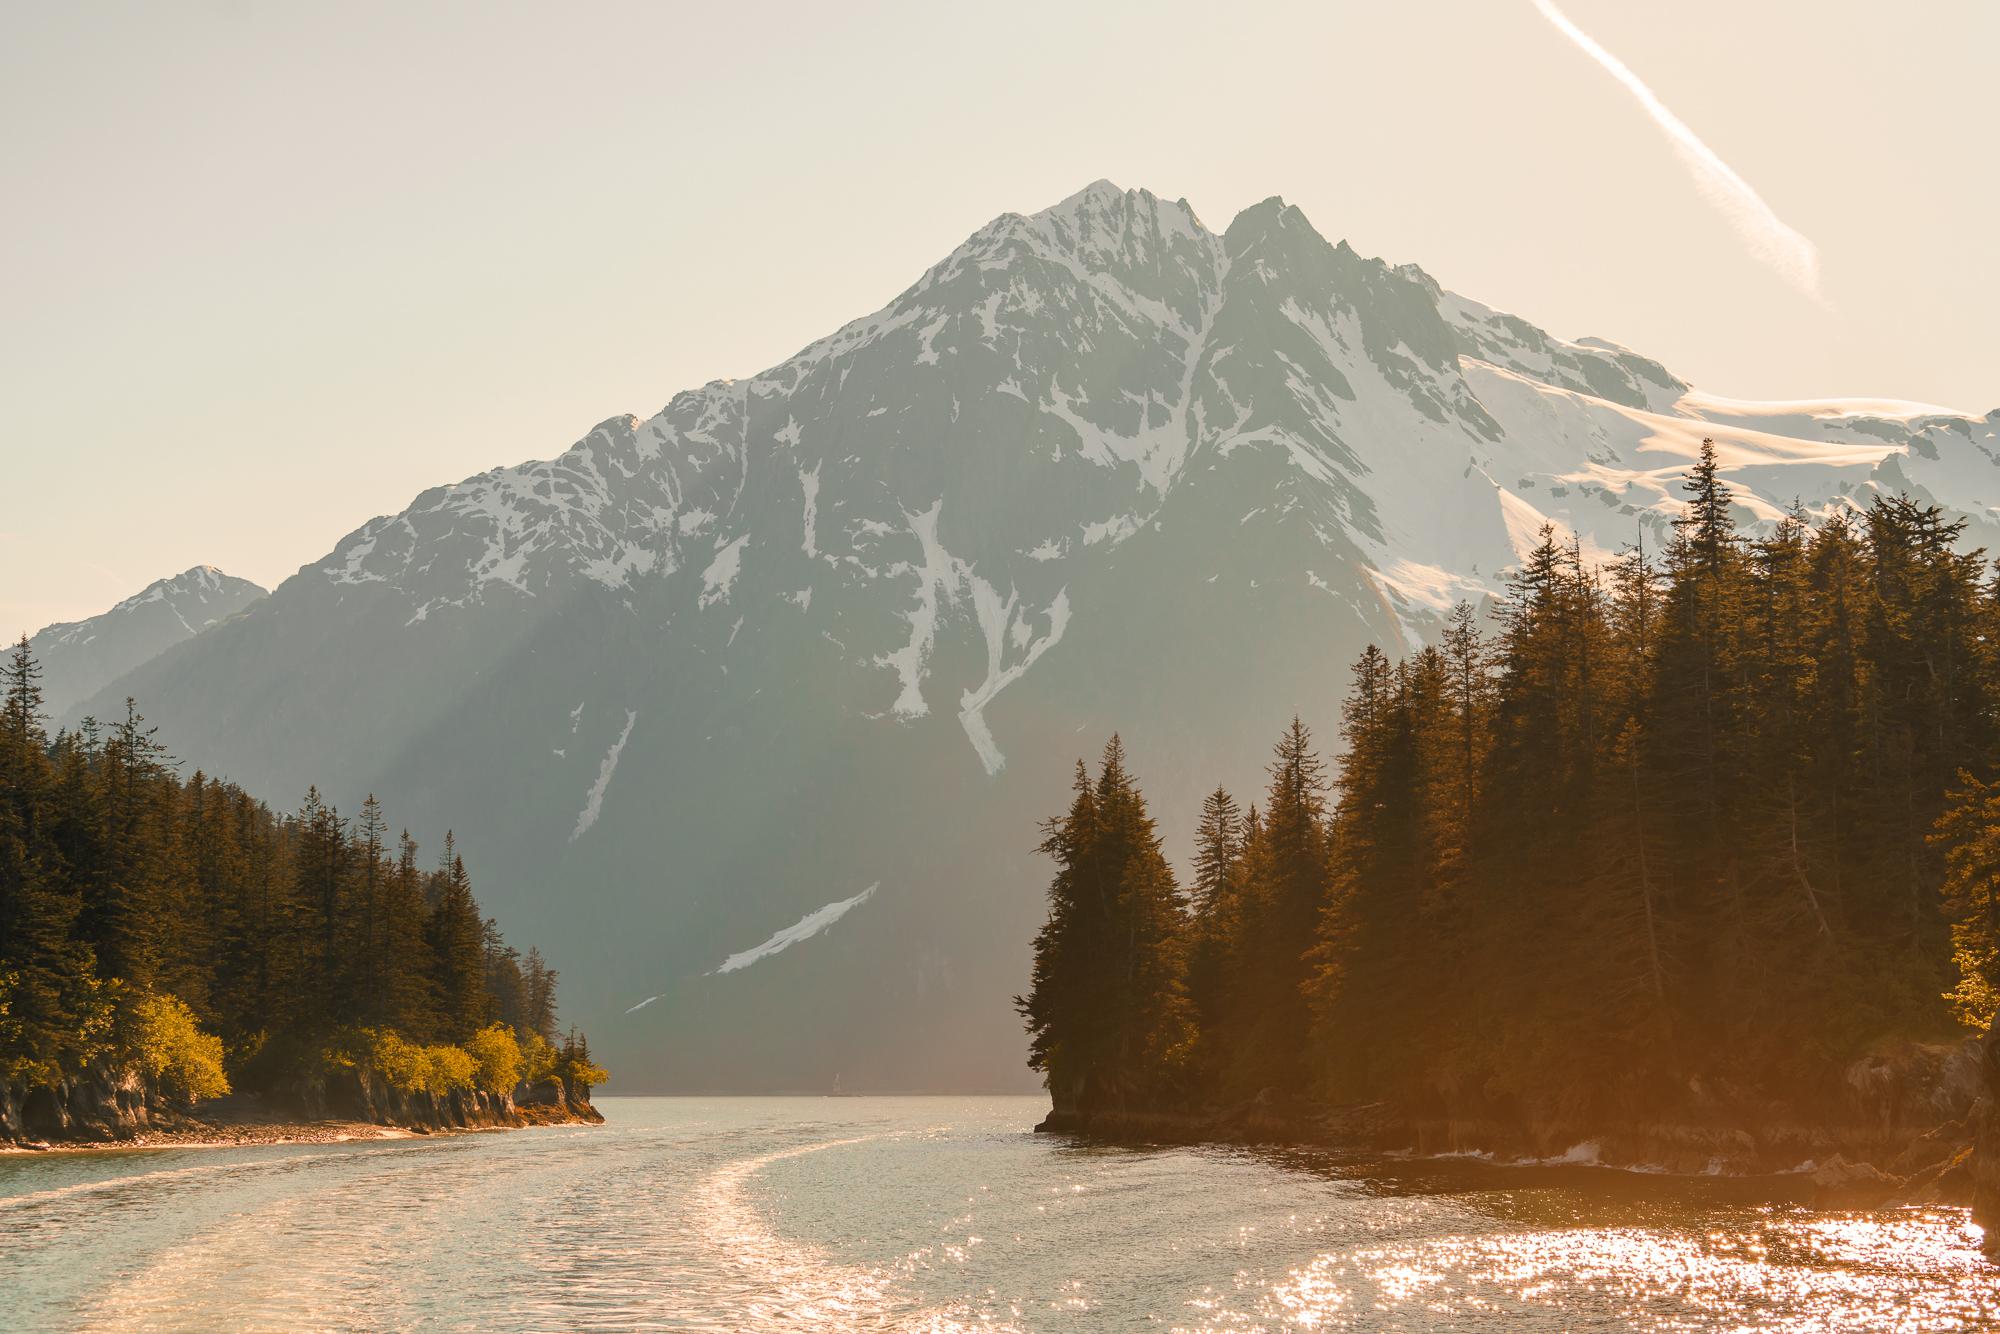 Alaska in Pictures